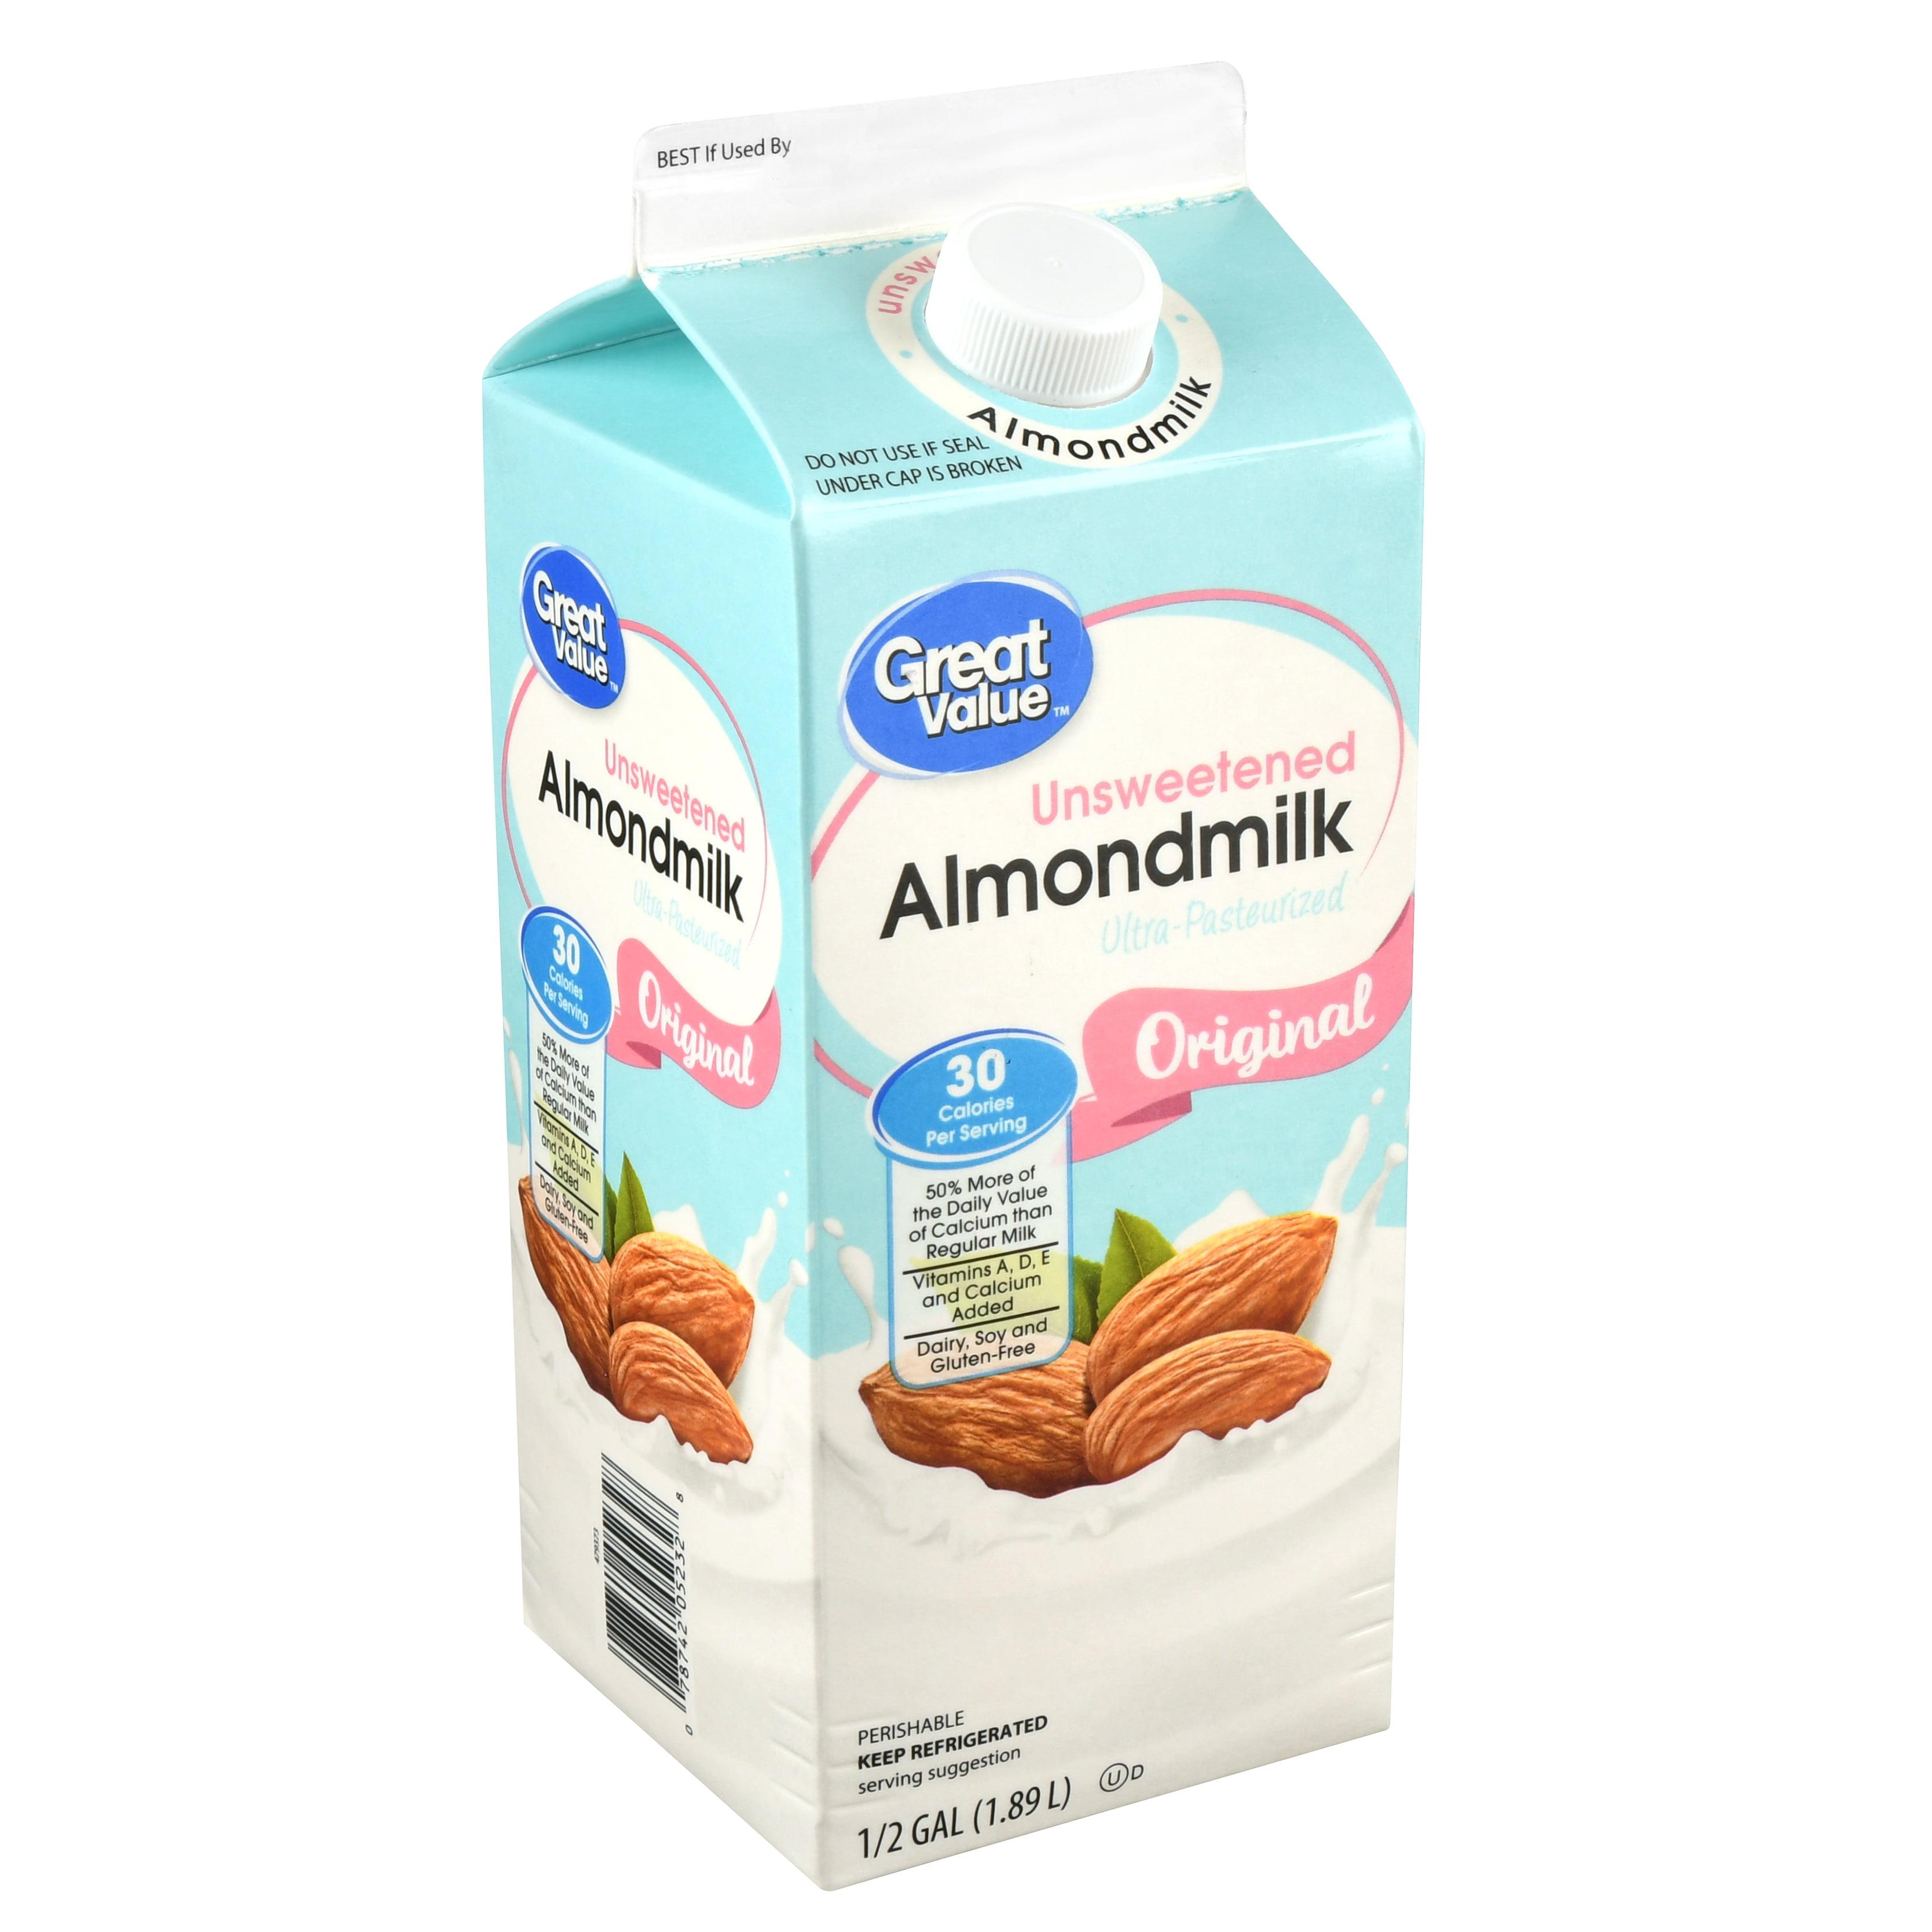 Great Value Original Unsweetened Almond Milk, 0.5 Gal